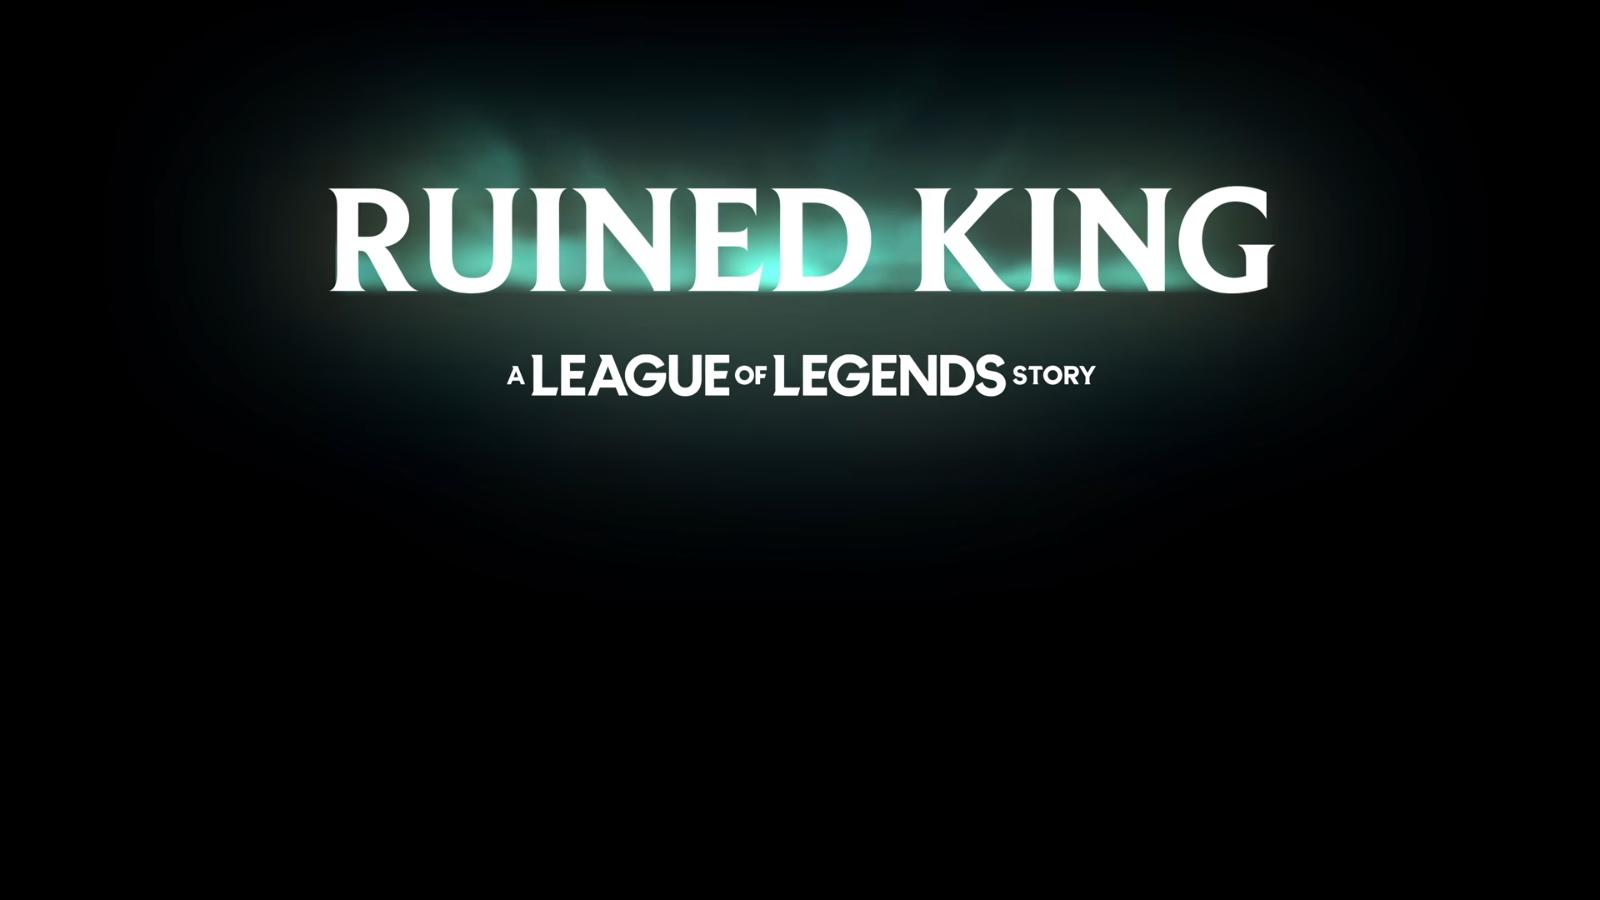 Annunciato Ruined King: A League of Legends Story tramite un trailer